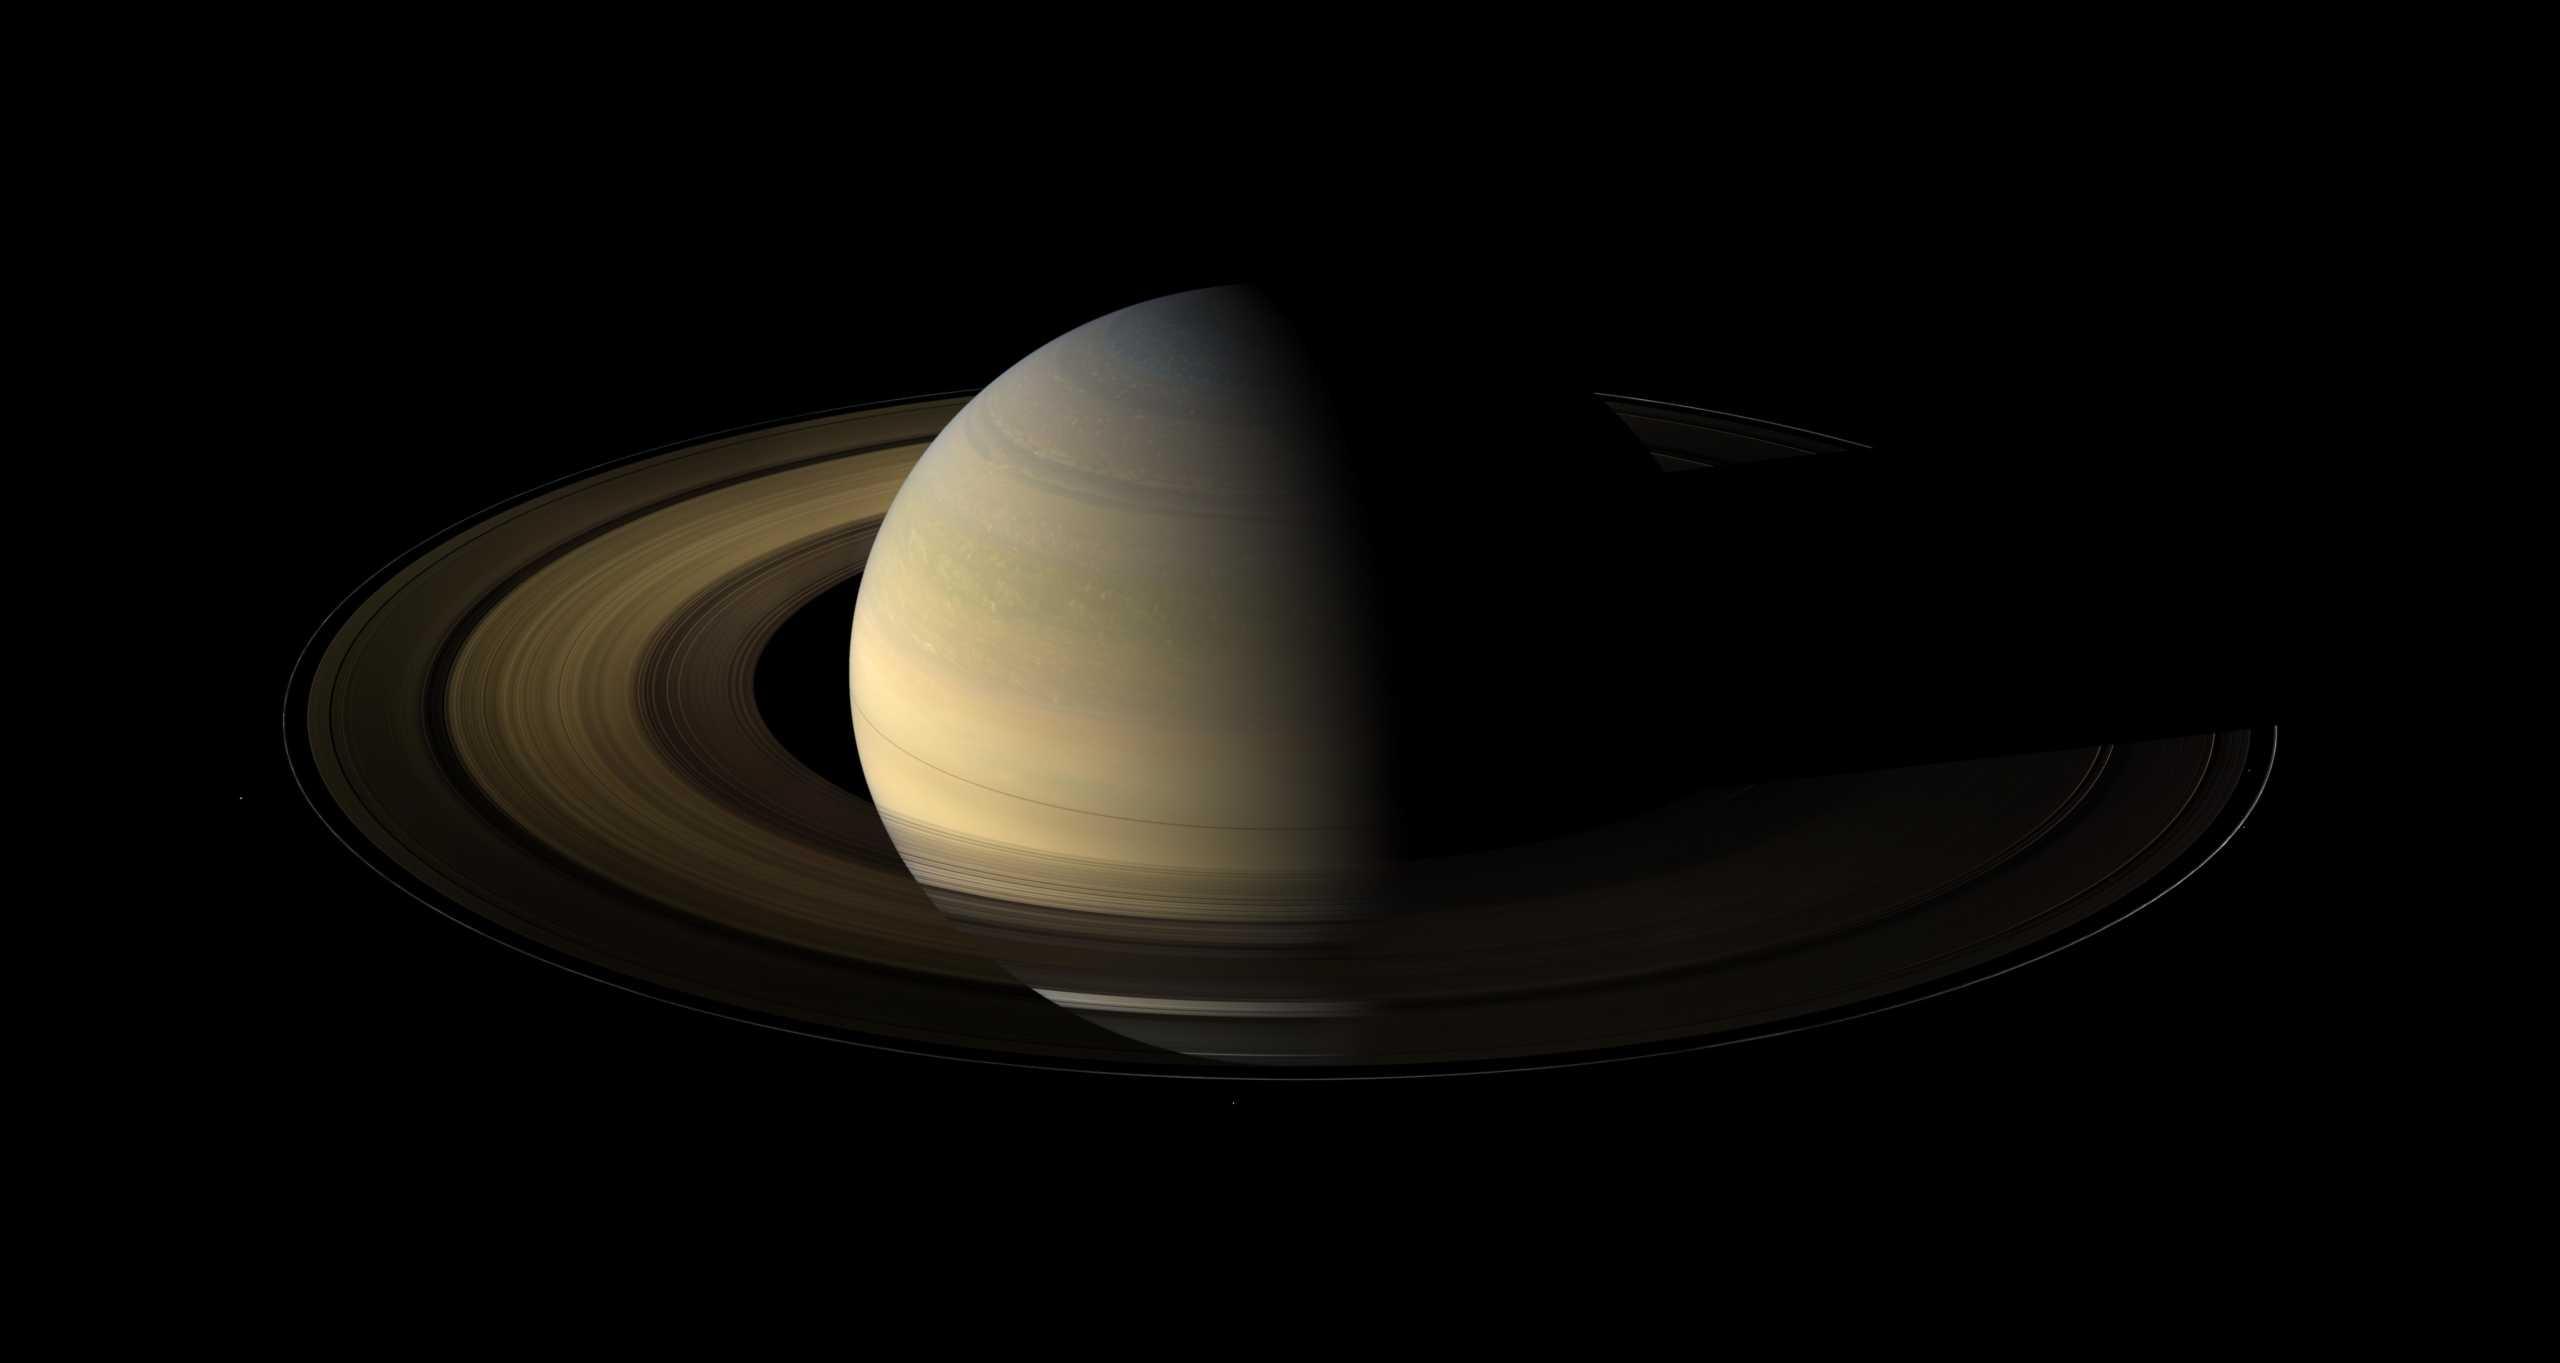 Planeta Saturn primavara nasa imagine